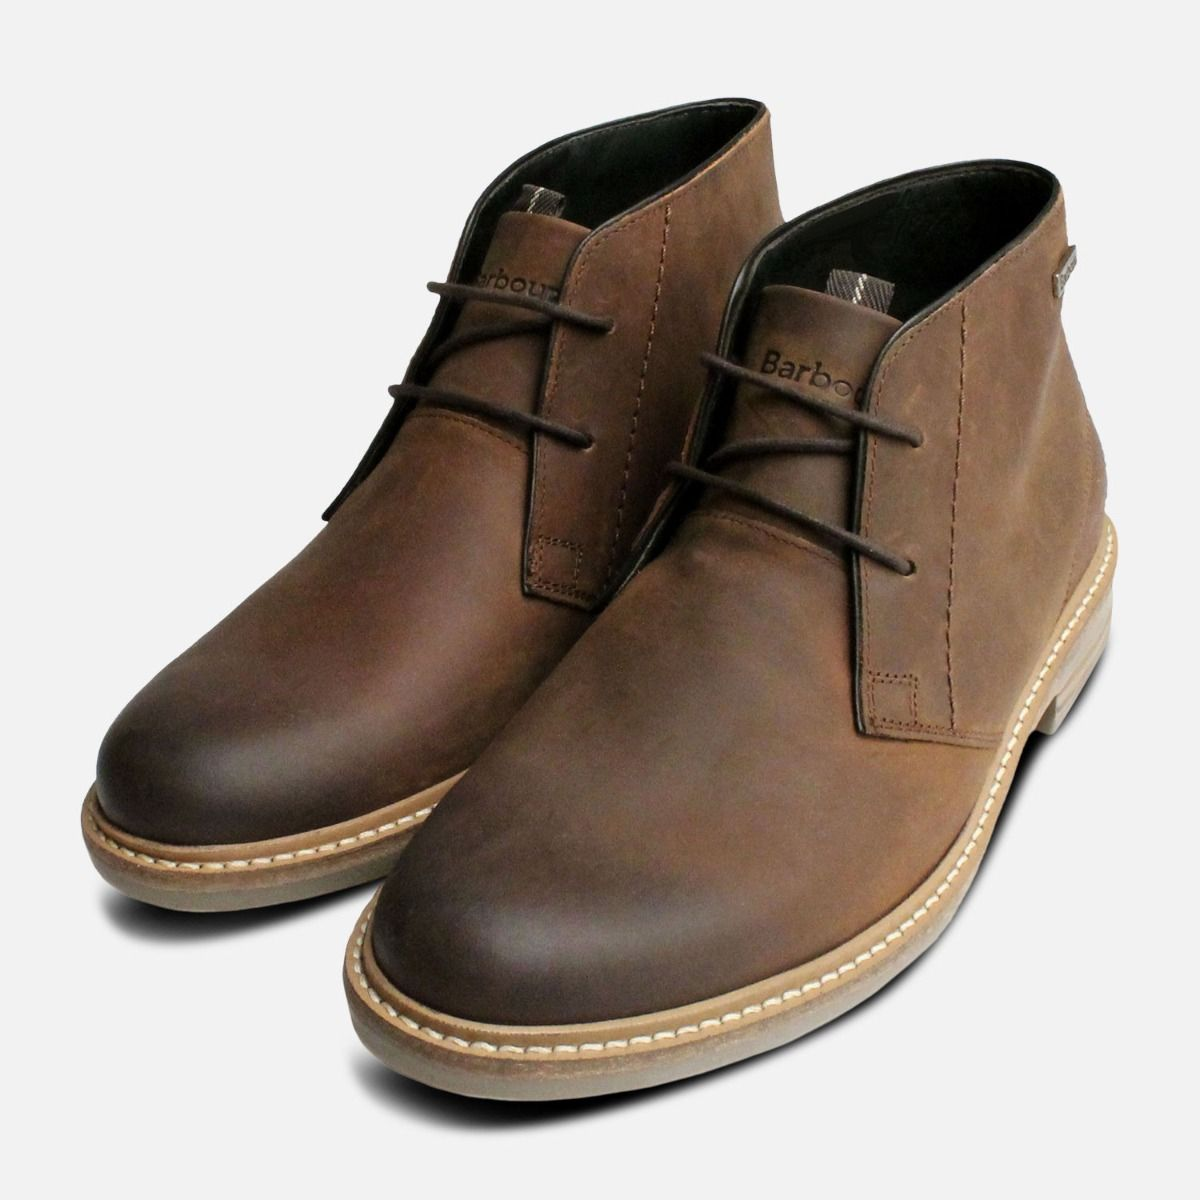 ec7b5374dc8 Brown Waxy Barbour Chukka Boots